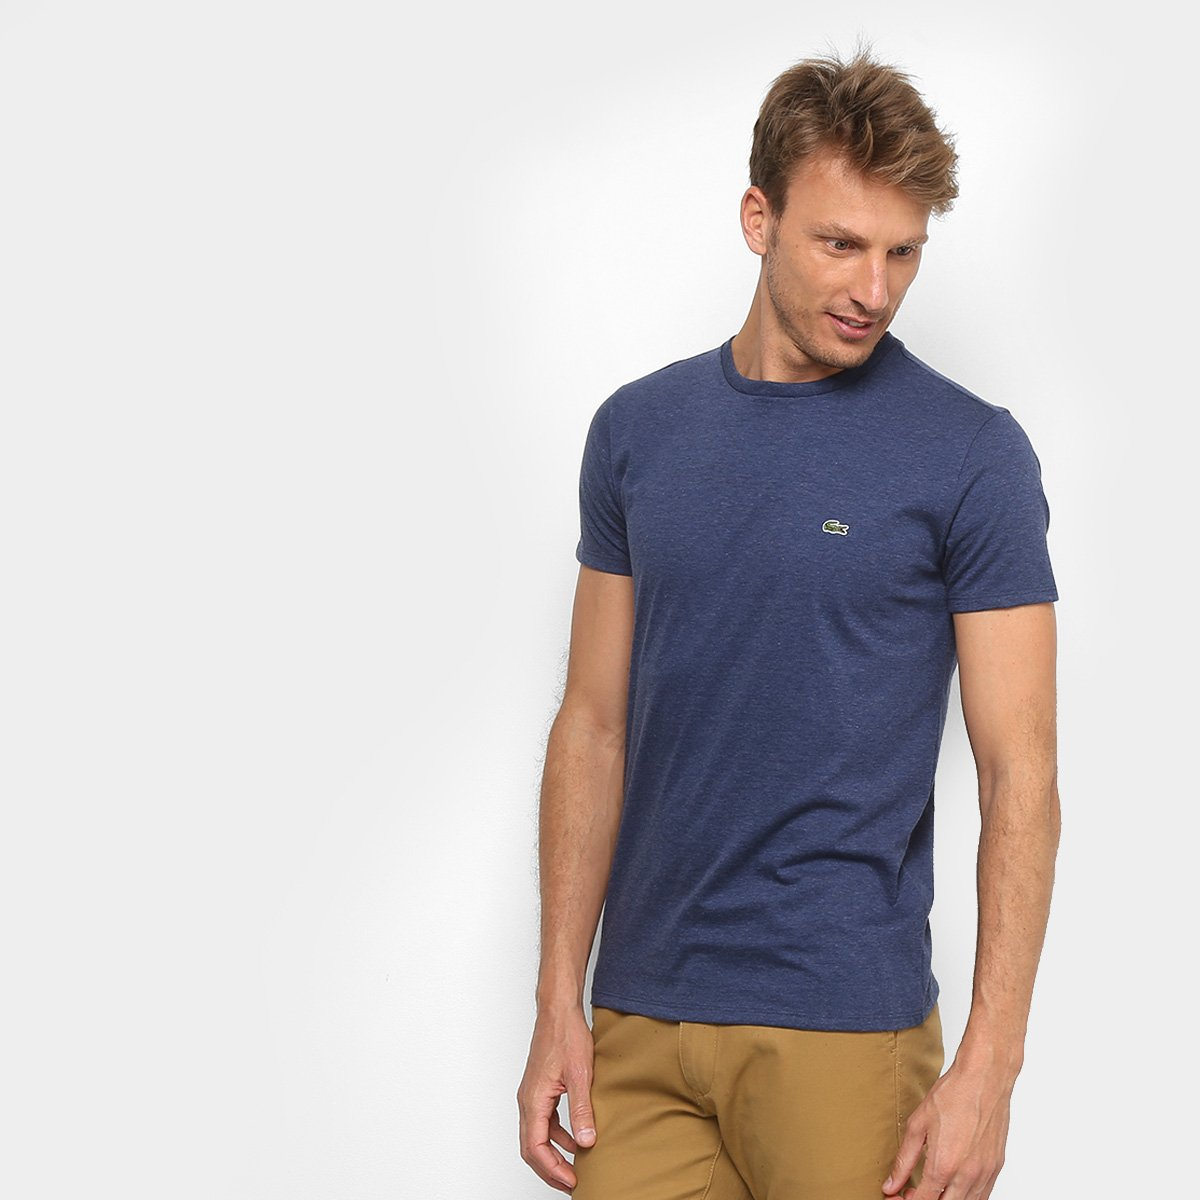 30af695dff18f Camiseta Lacoste Básica Jersey Masculina - Azul Escuro - Compre Agora